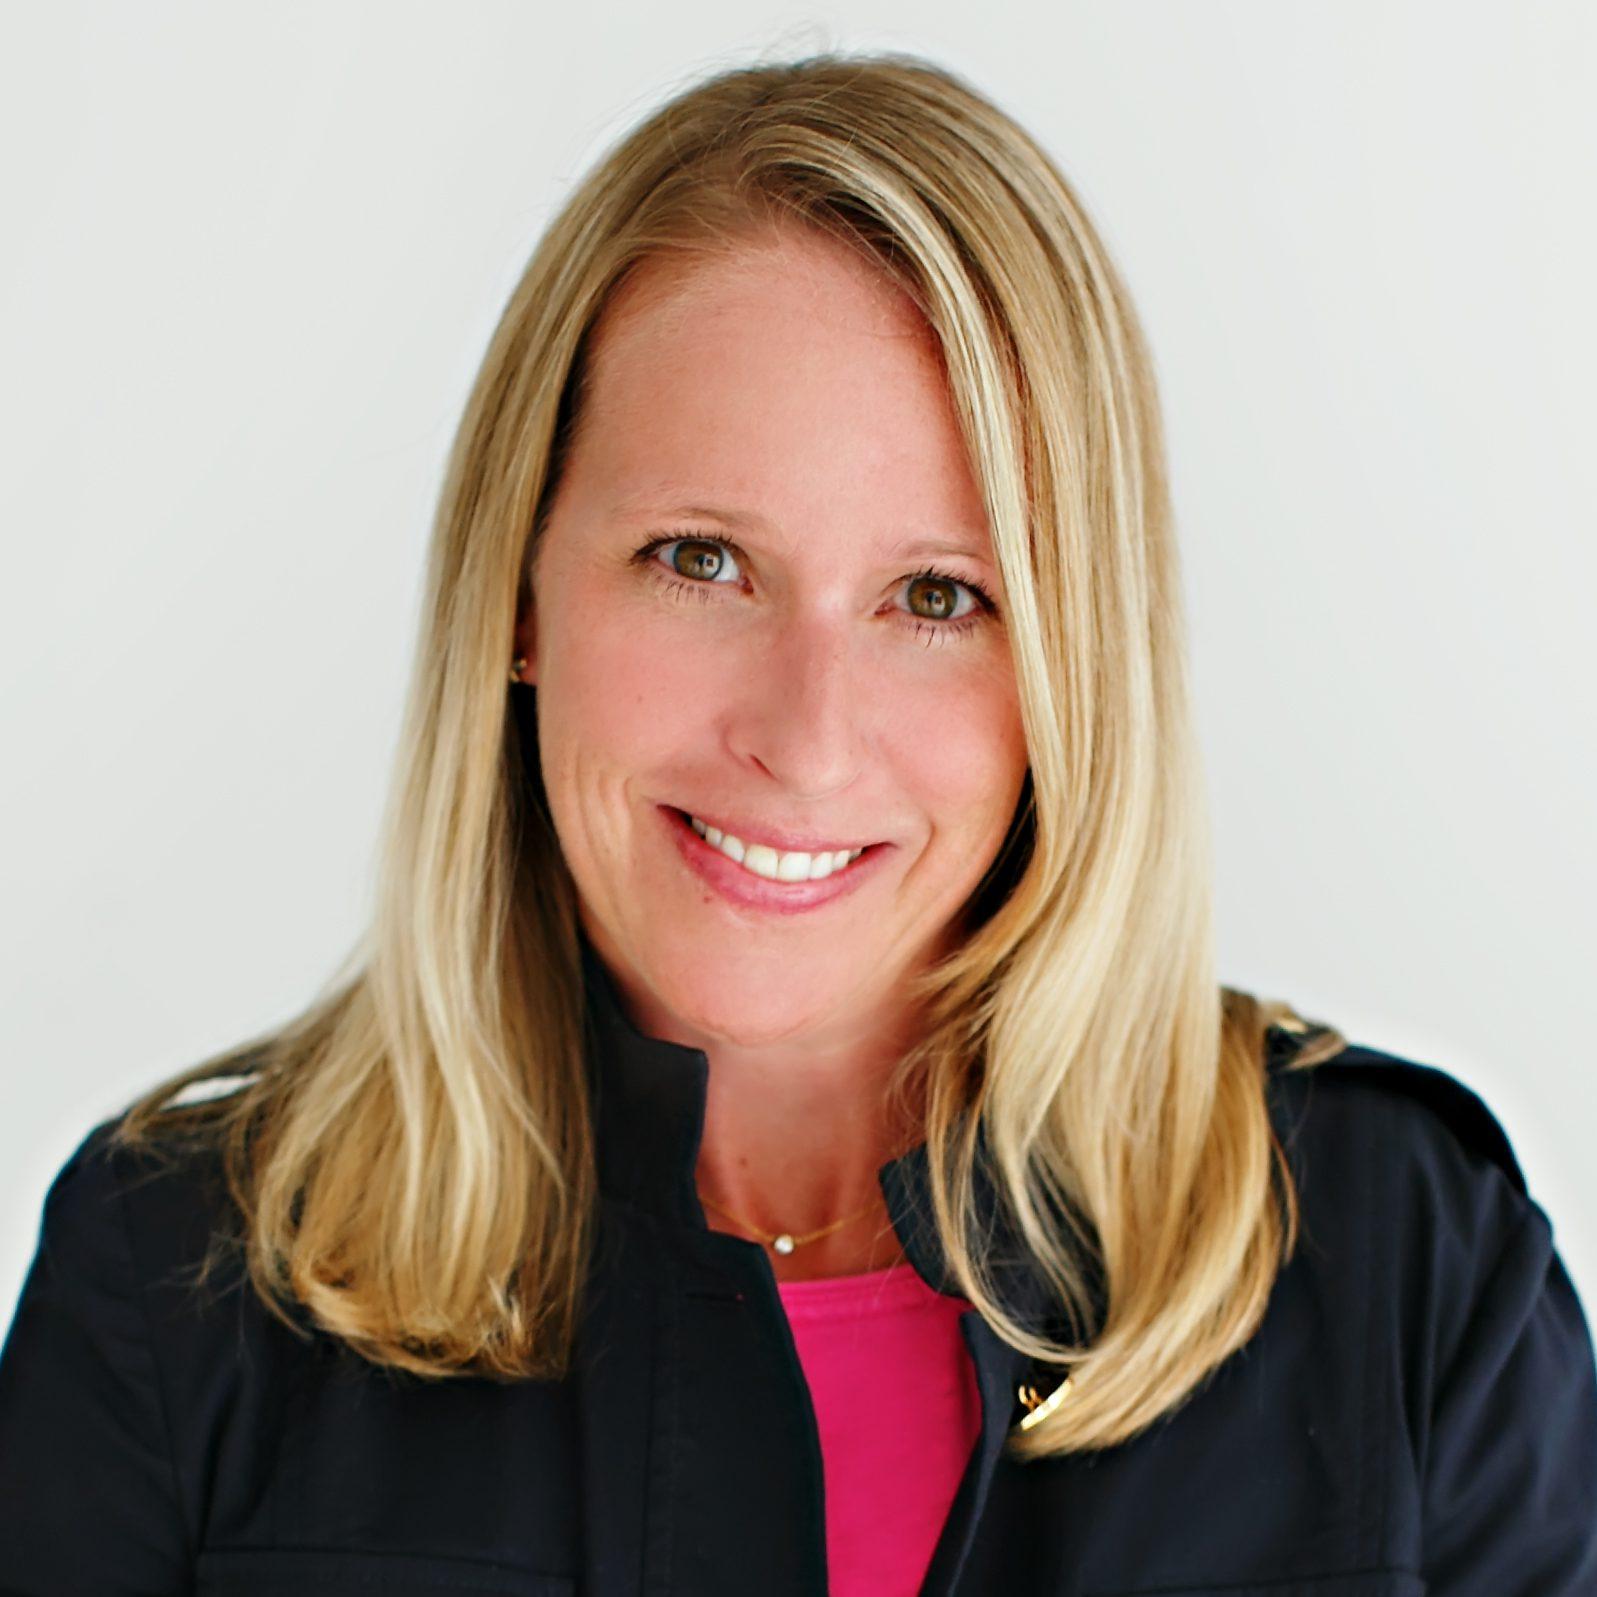 Emily Giebel, Sales Manager/ Design Consultant